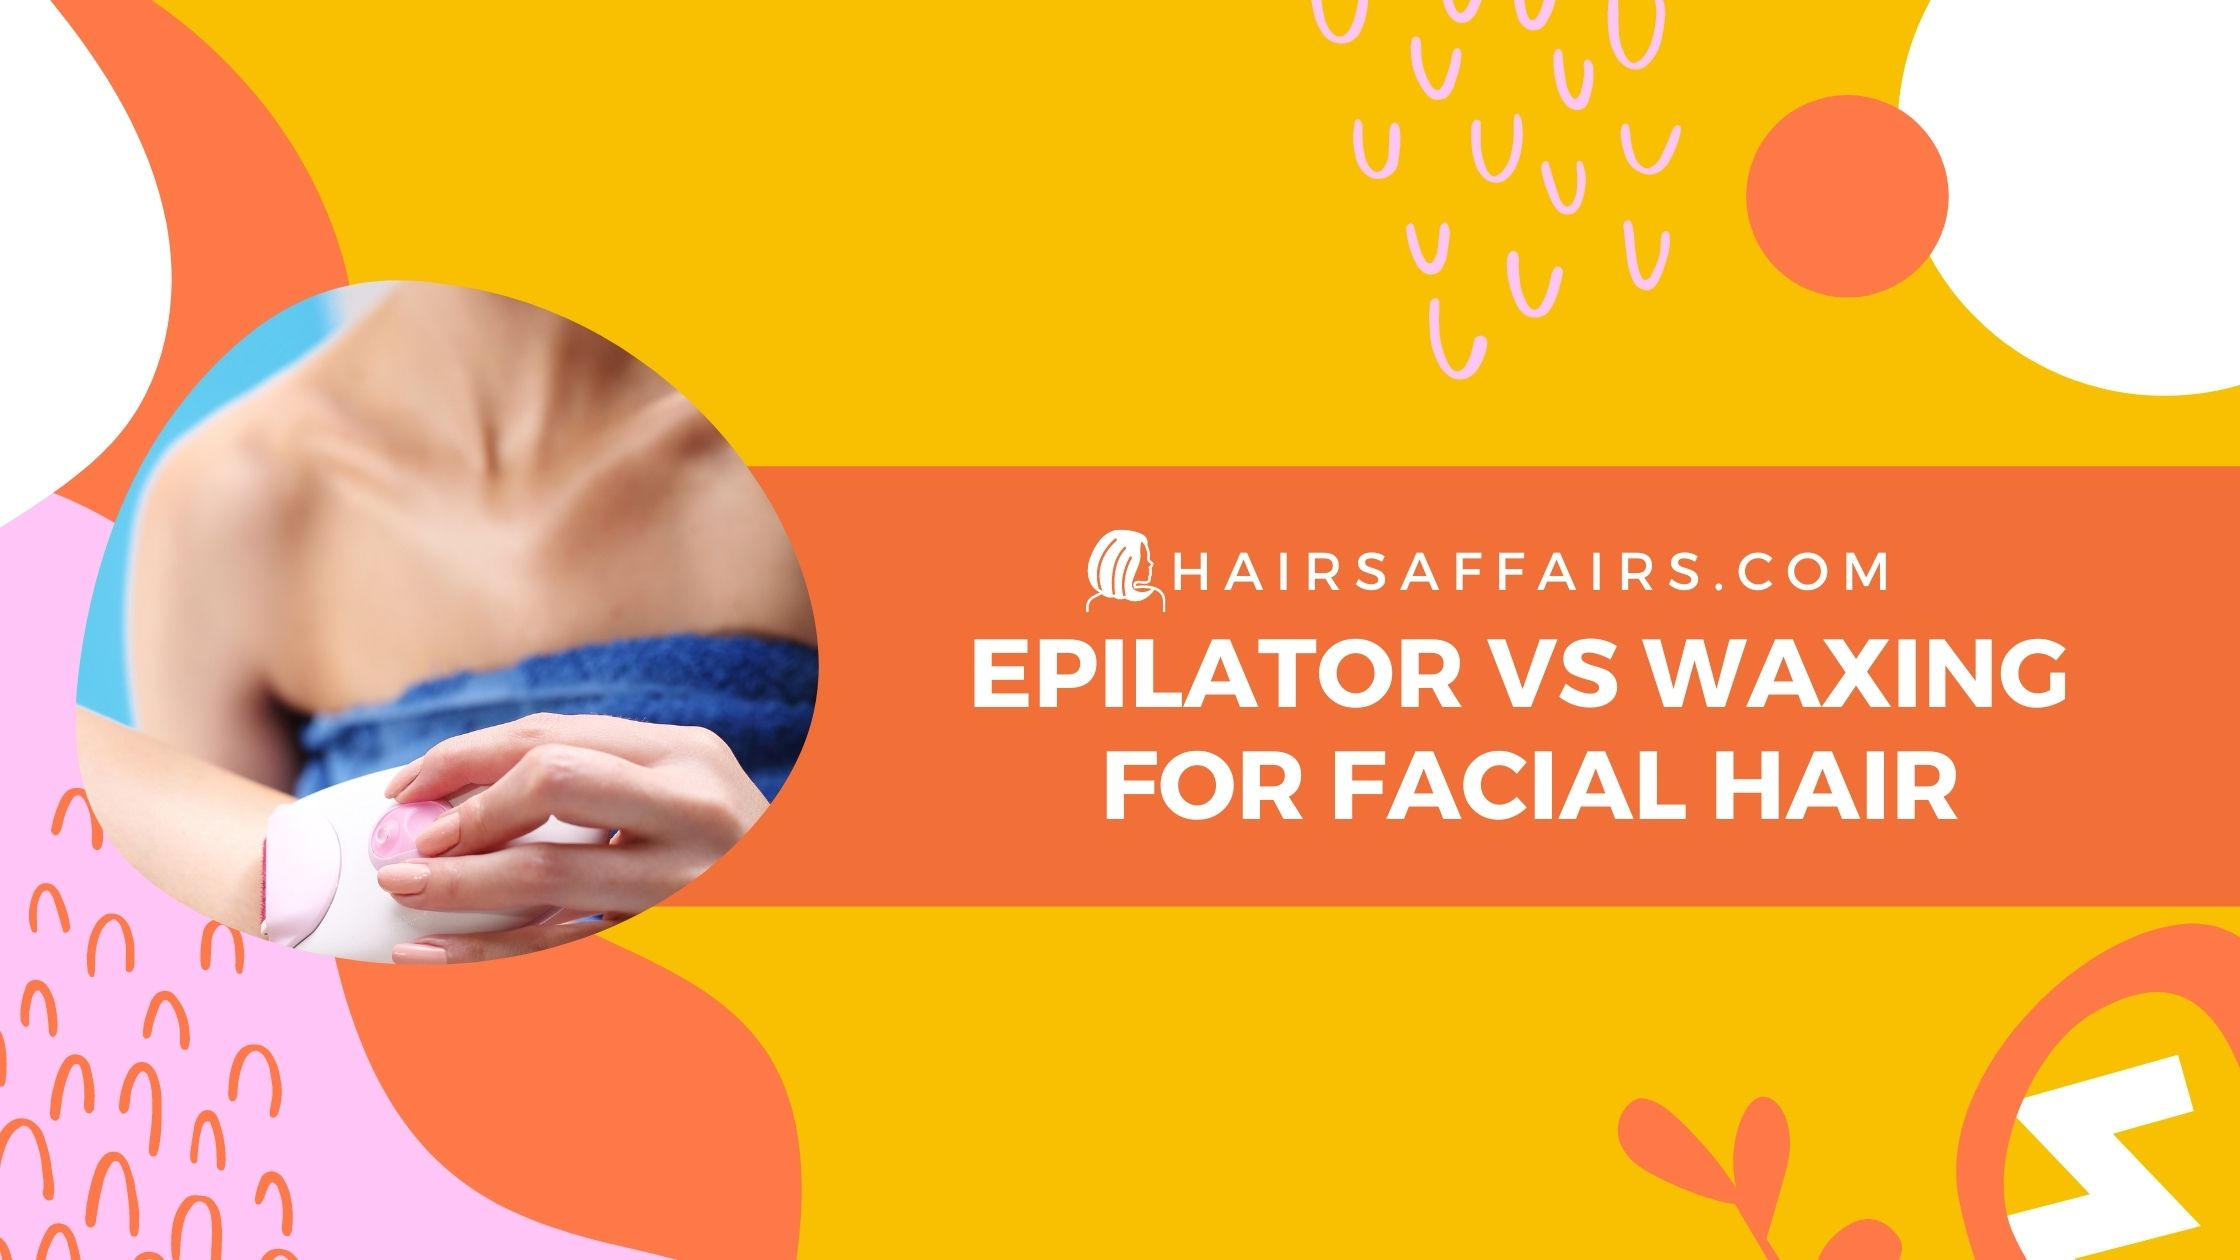 HA-Epilator-vs-Waxing-for-Facial-Hair